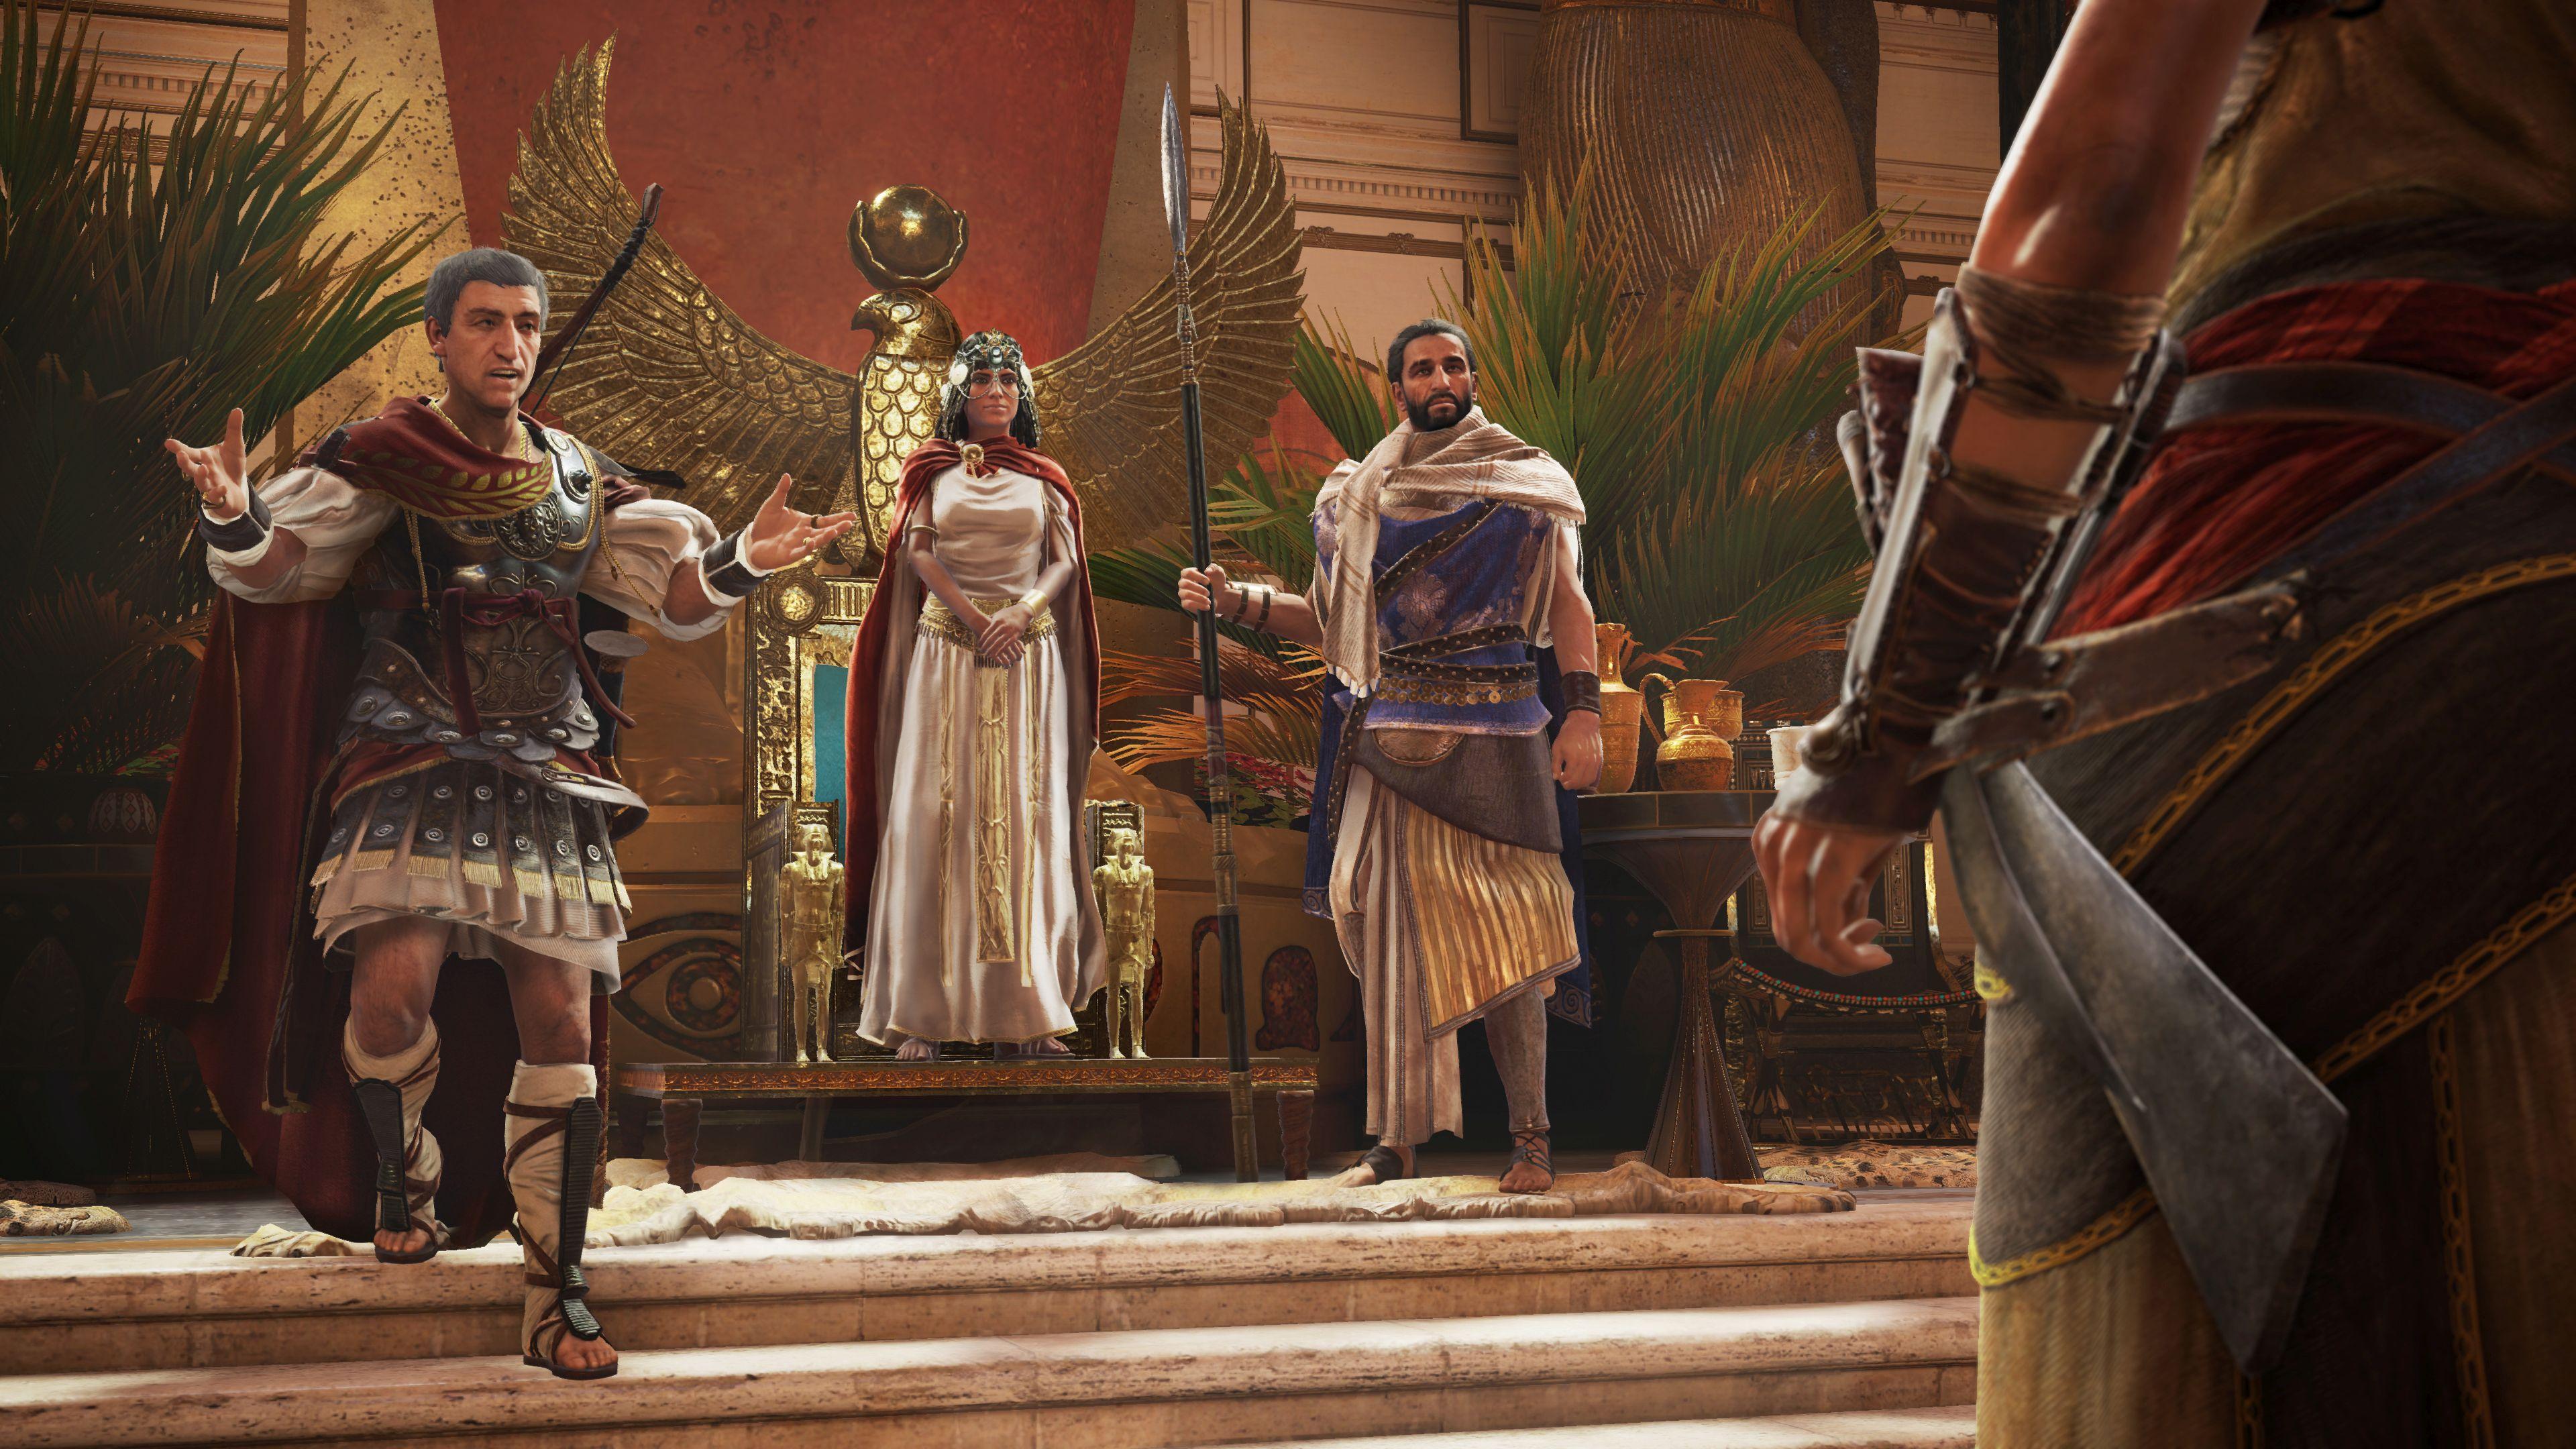 Julius Caesar And Cleopatra Debut In New Assassin S Creed Origins